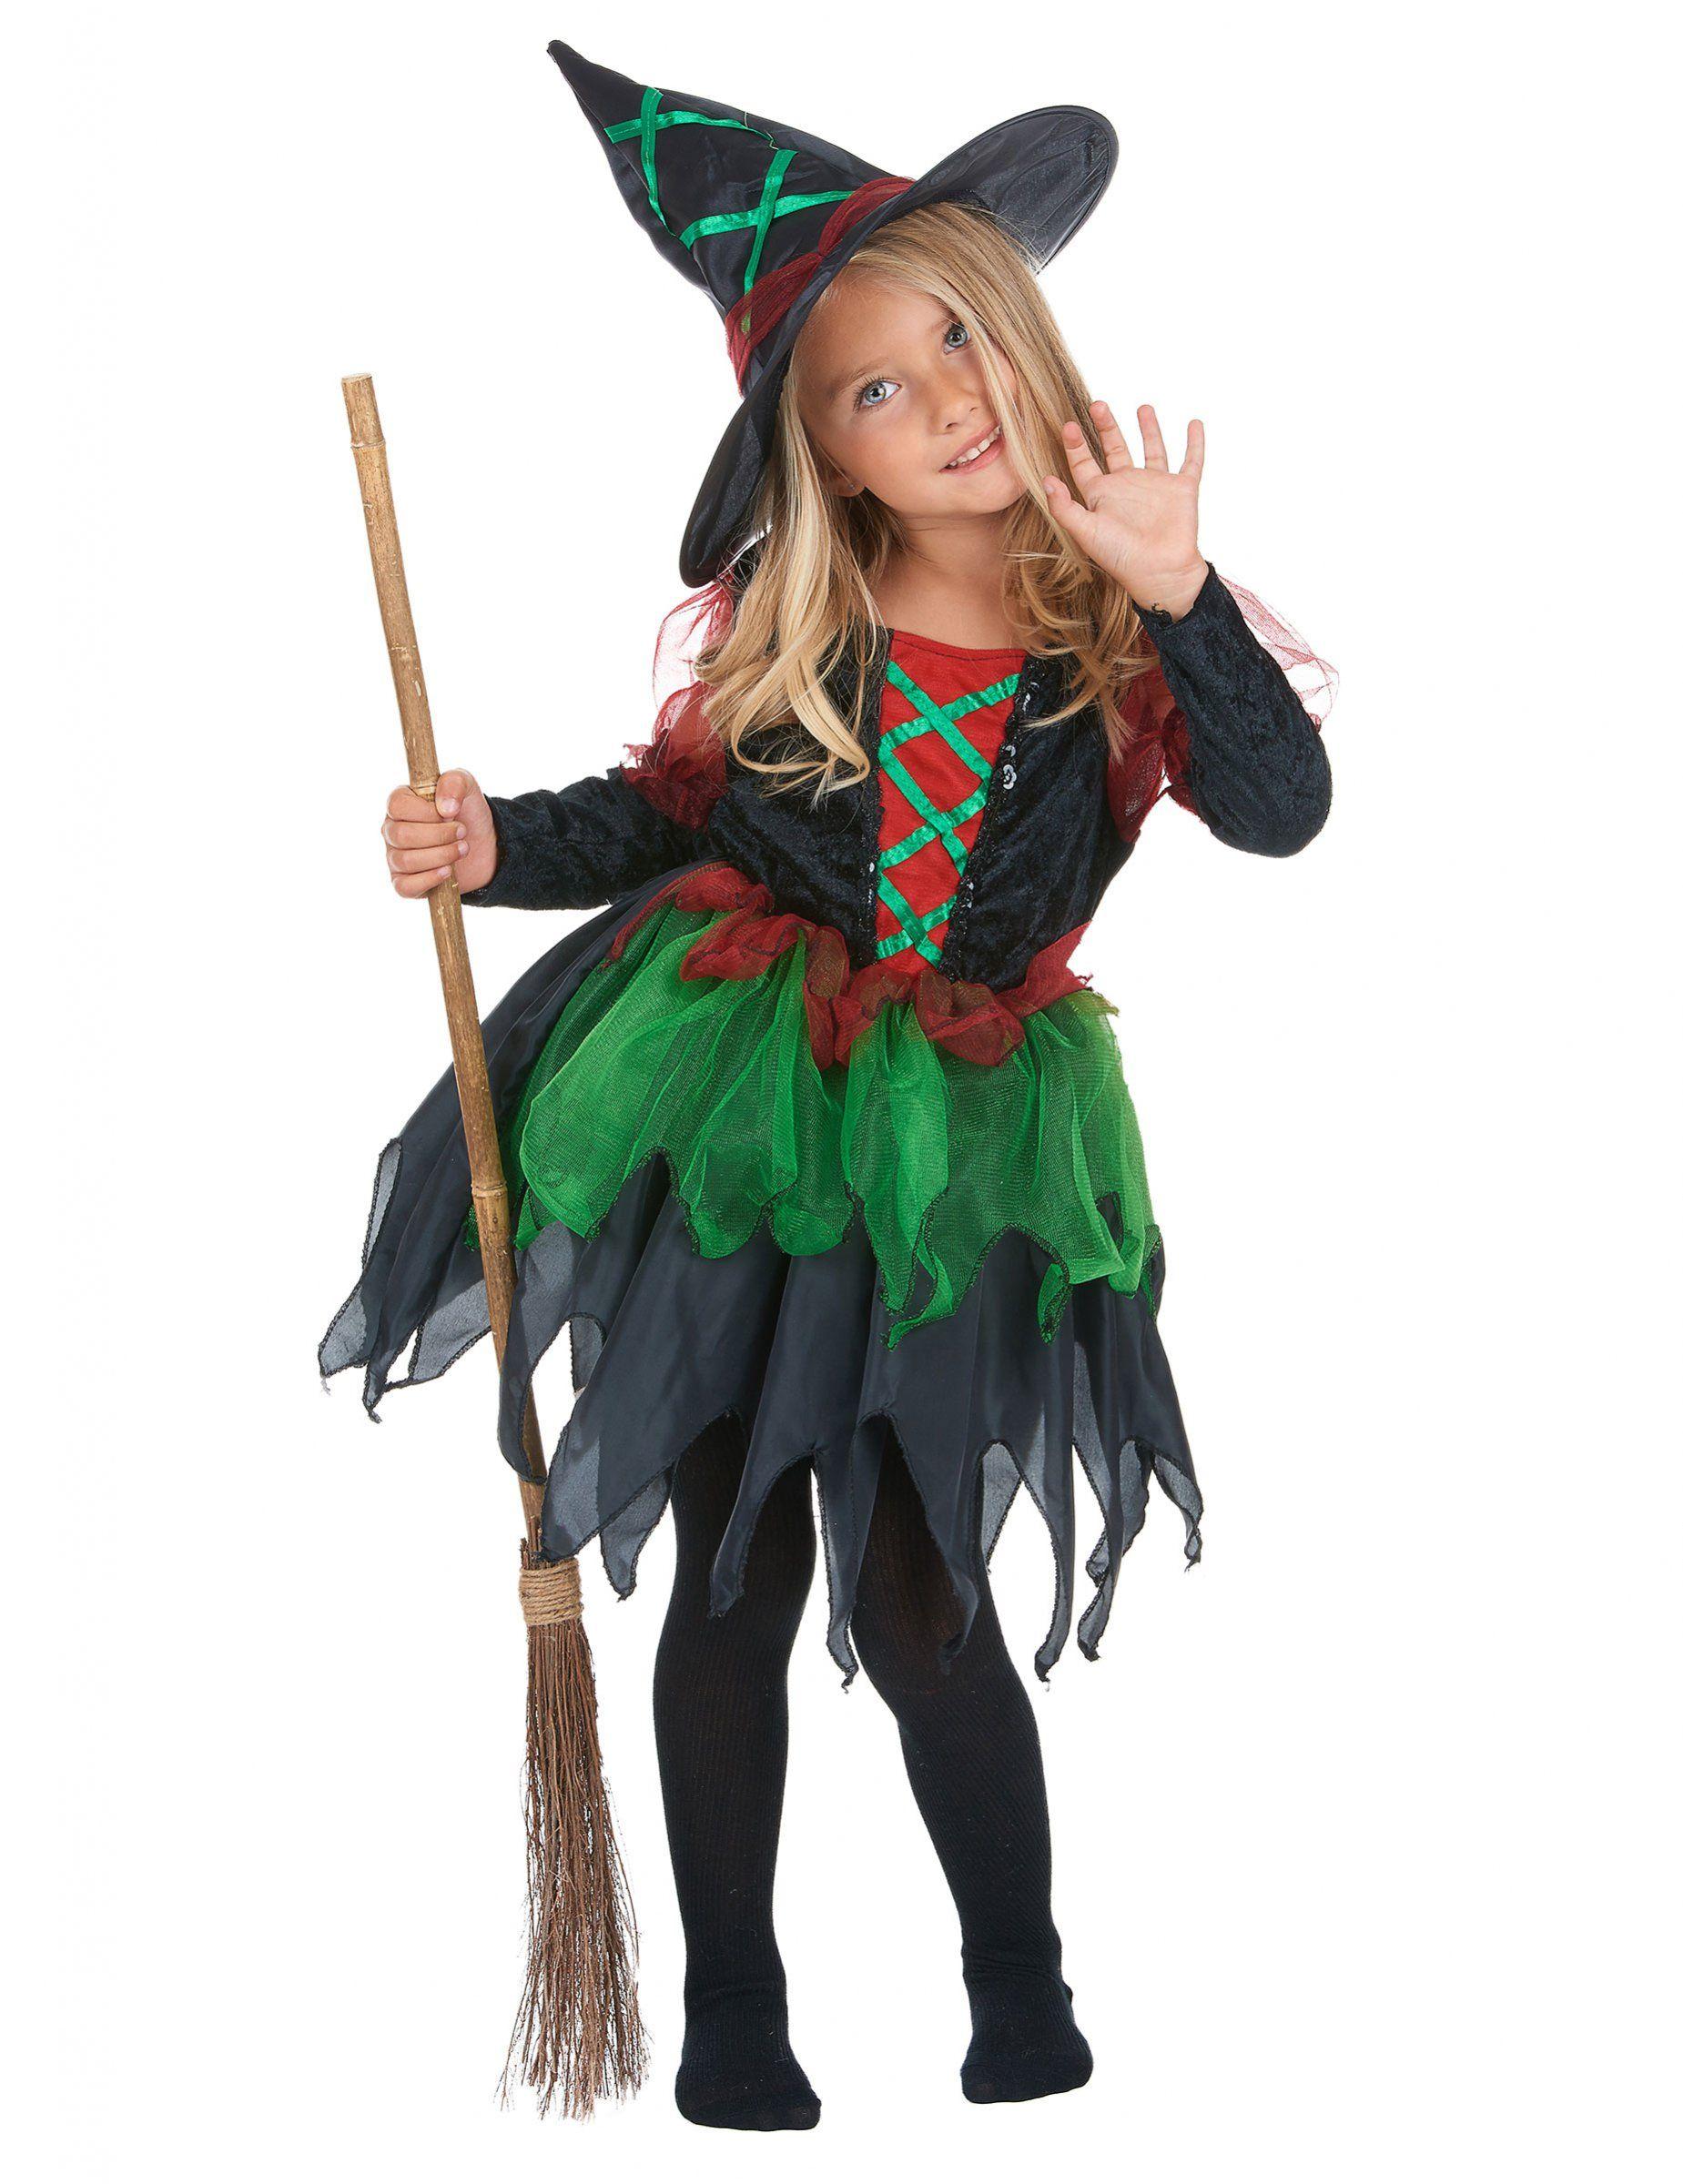 Disfraz de bruja del bosque para niña, ideal para